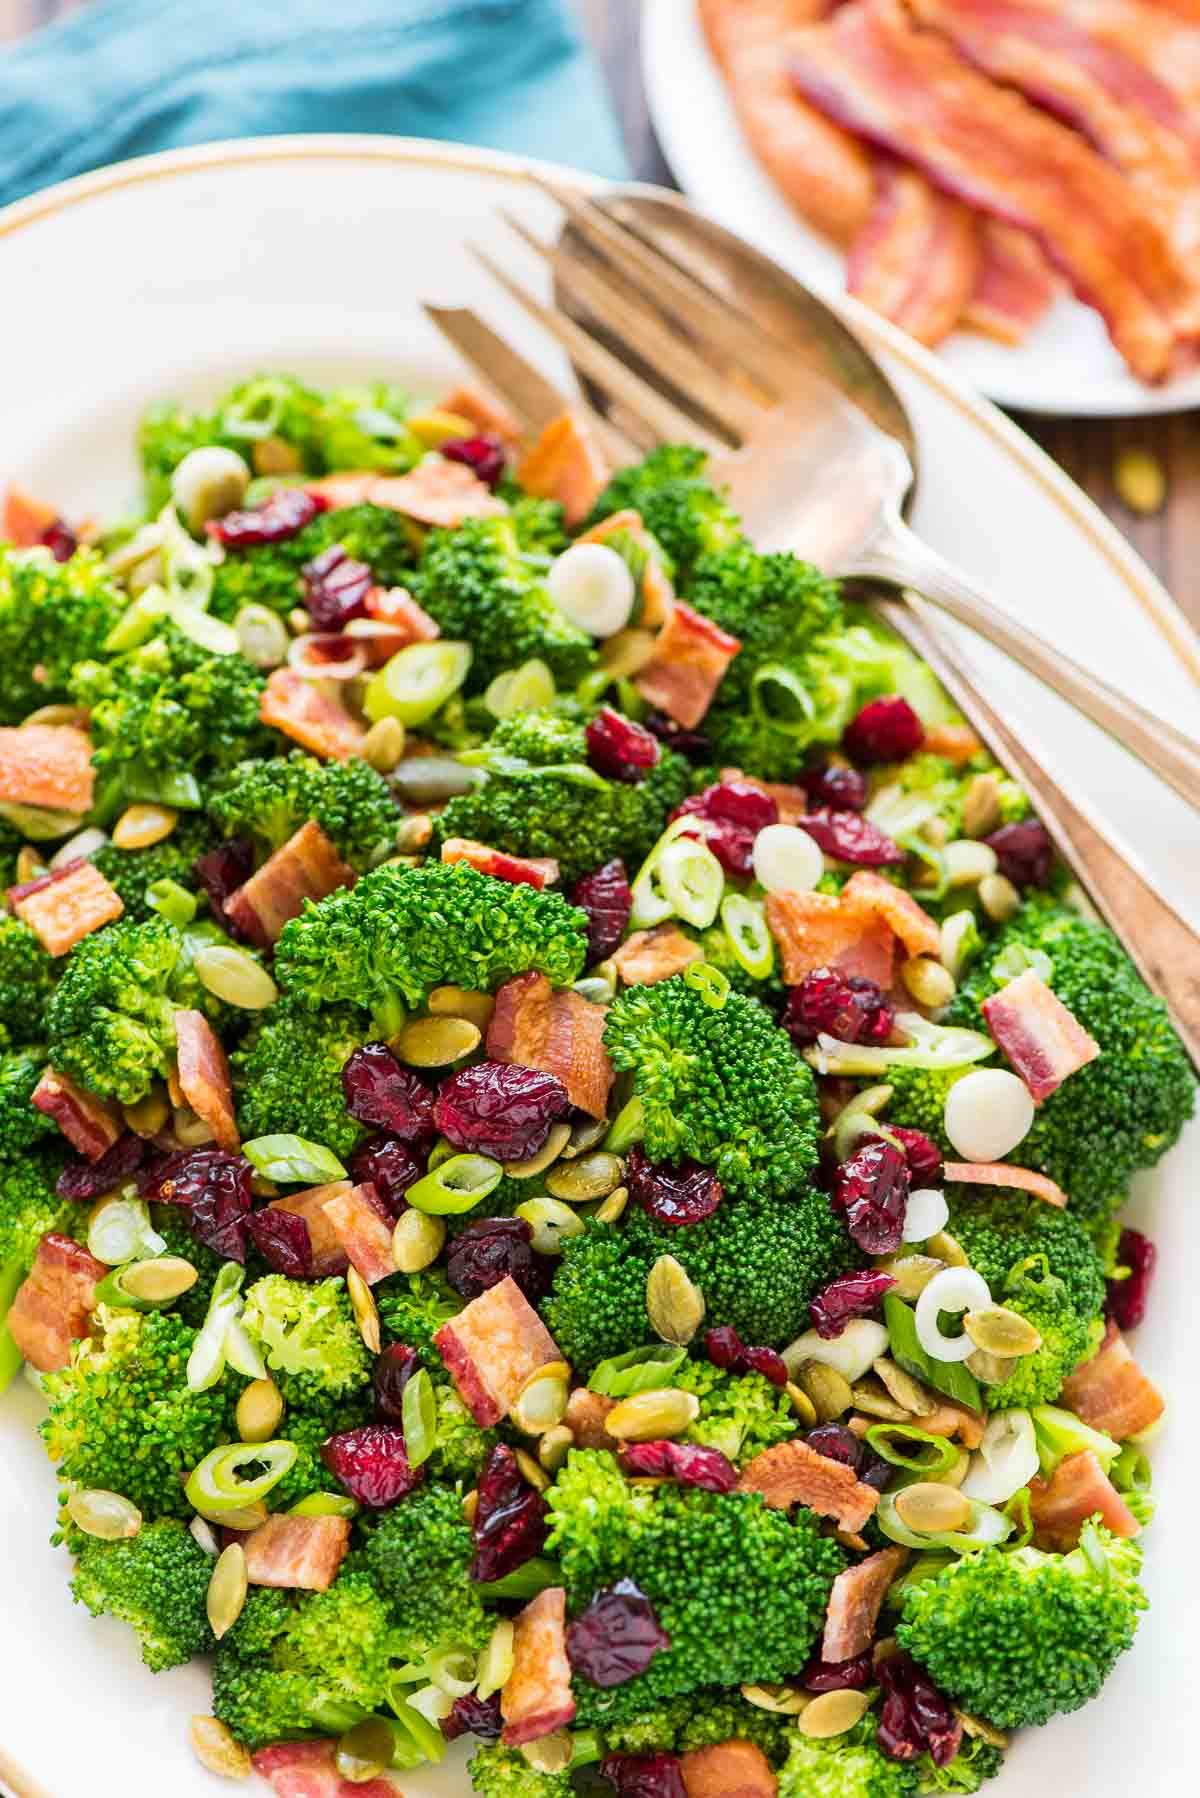 Healthy Side Salads  Broccoli Cranberry Salad